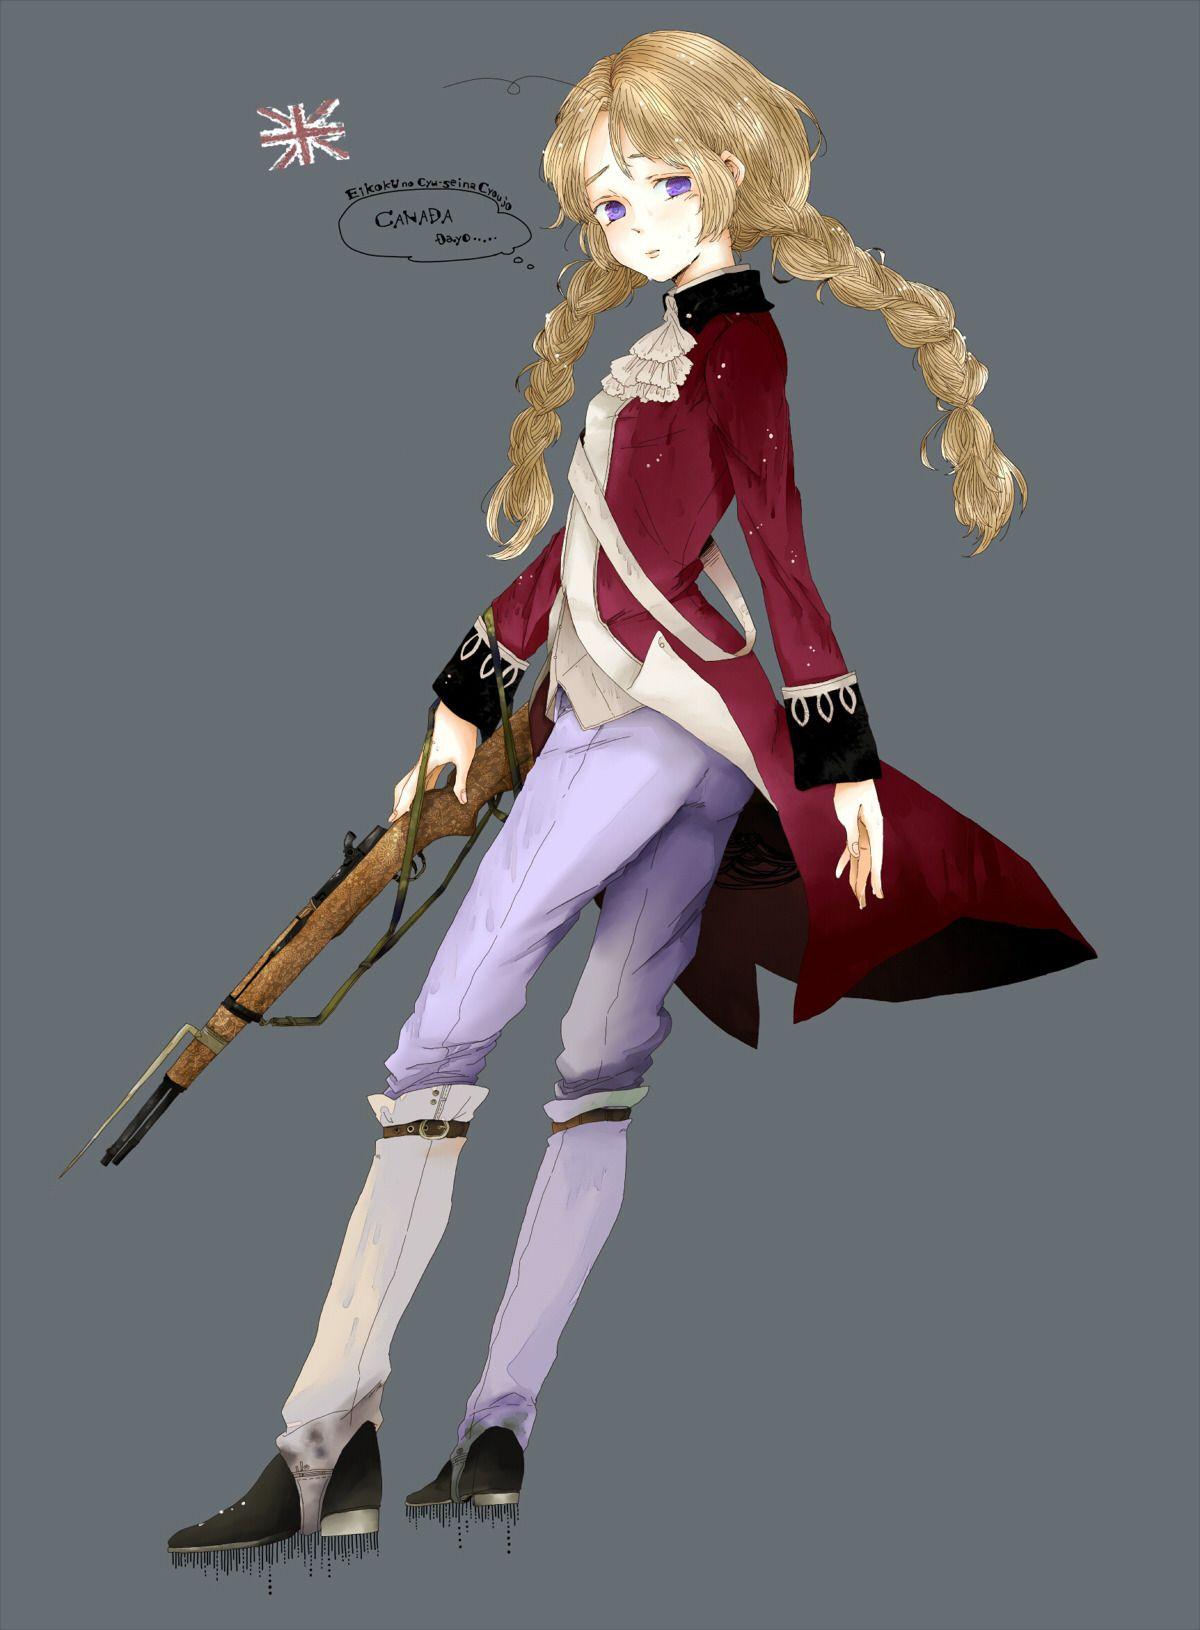 Historical Hetalia Historical hetalia, Hetalia, Anime